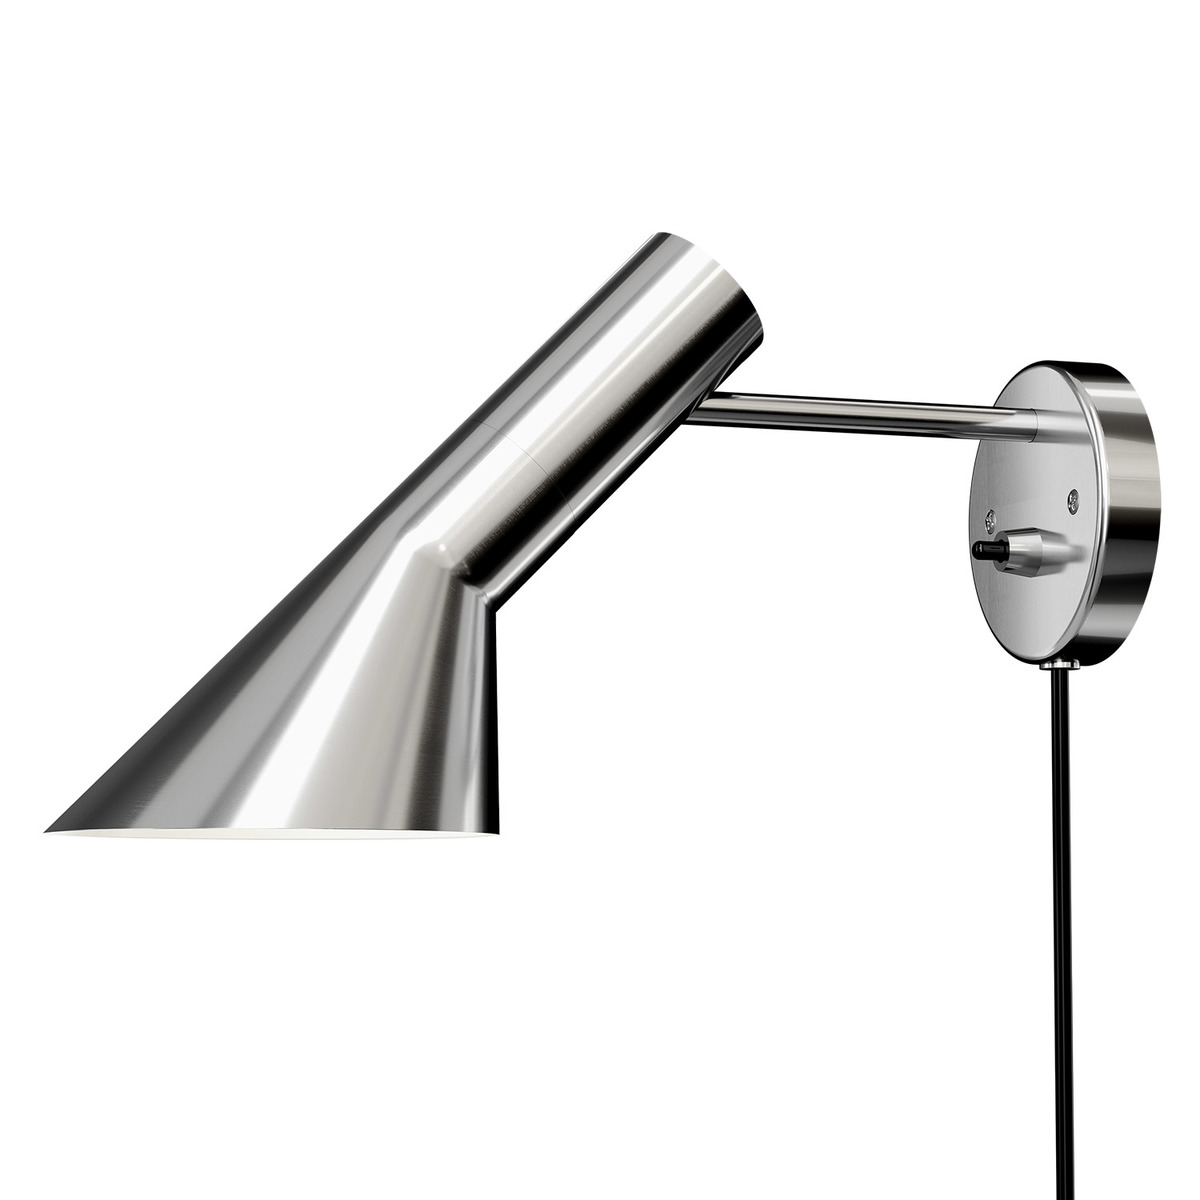 Louis Poulsen Aj Wall Lamp, Polished Stainless Steel